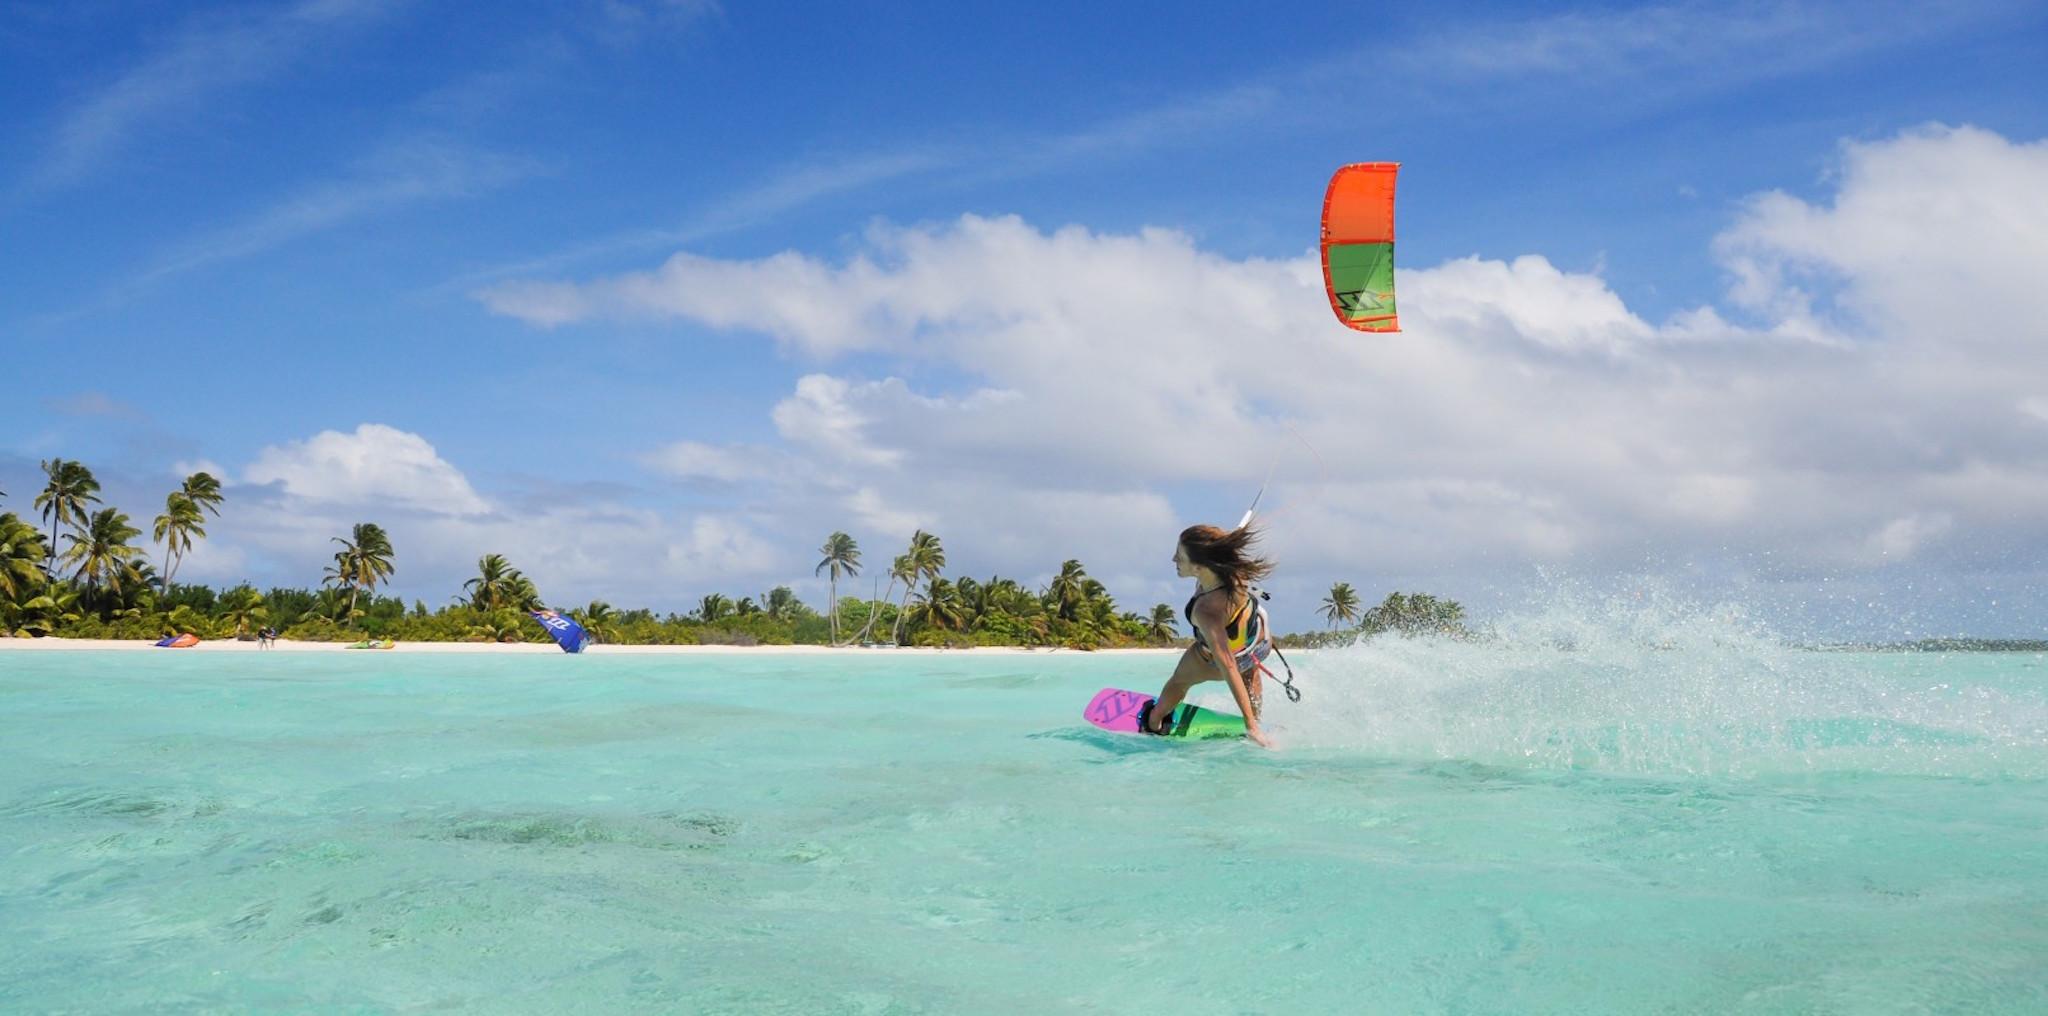 Cocos Keeling Island Kitesurfing Holidays And Travel Guides 187 Oceania 187 Australia Free